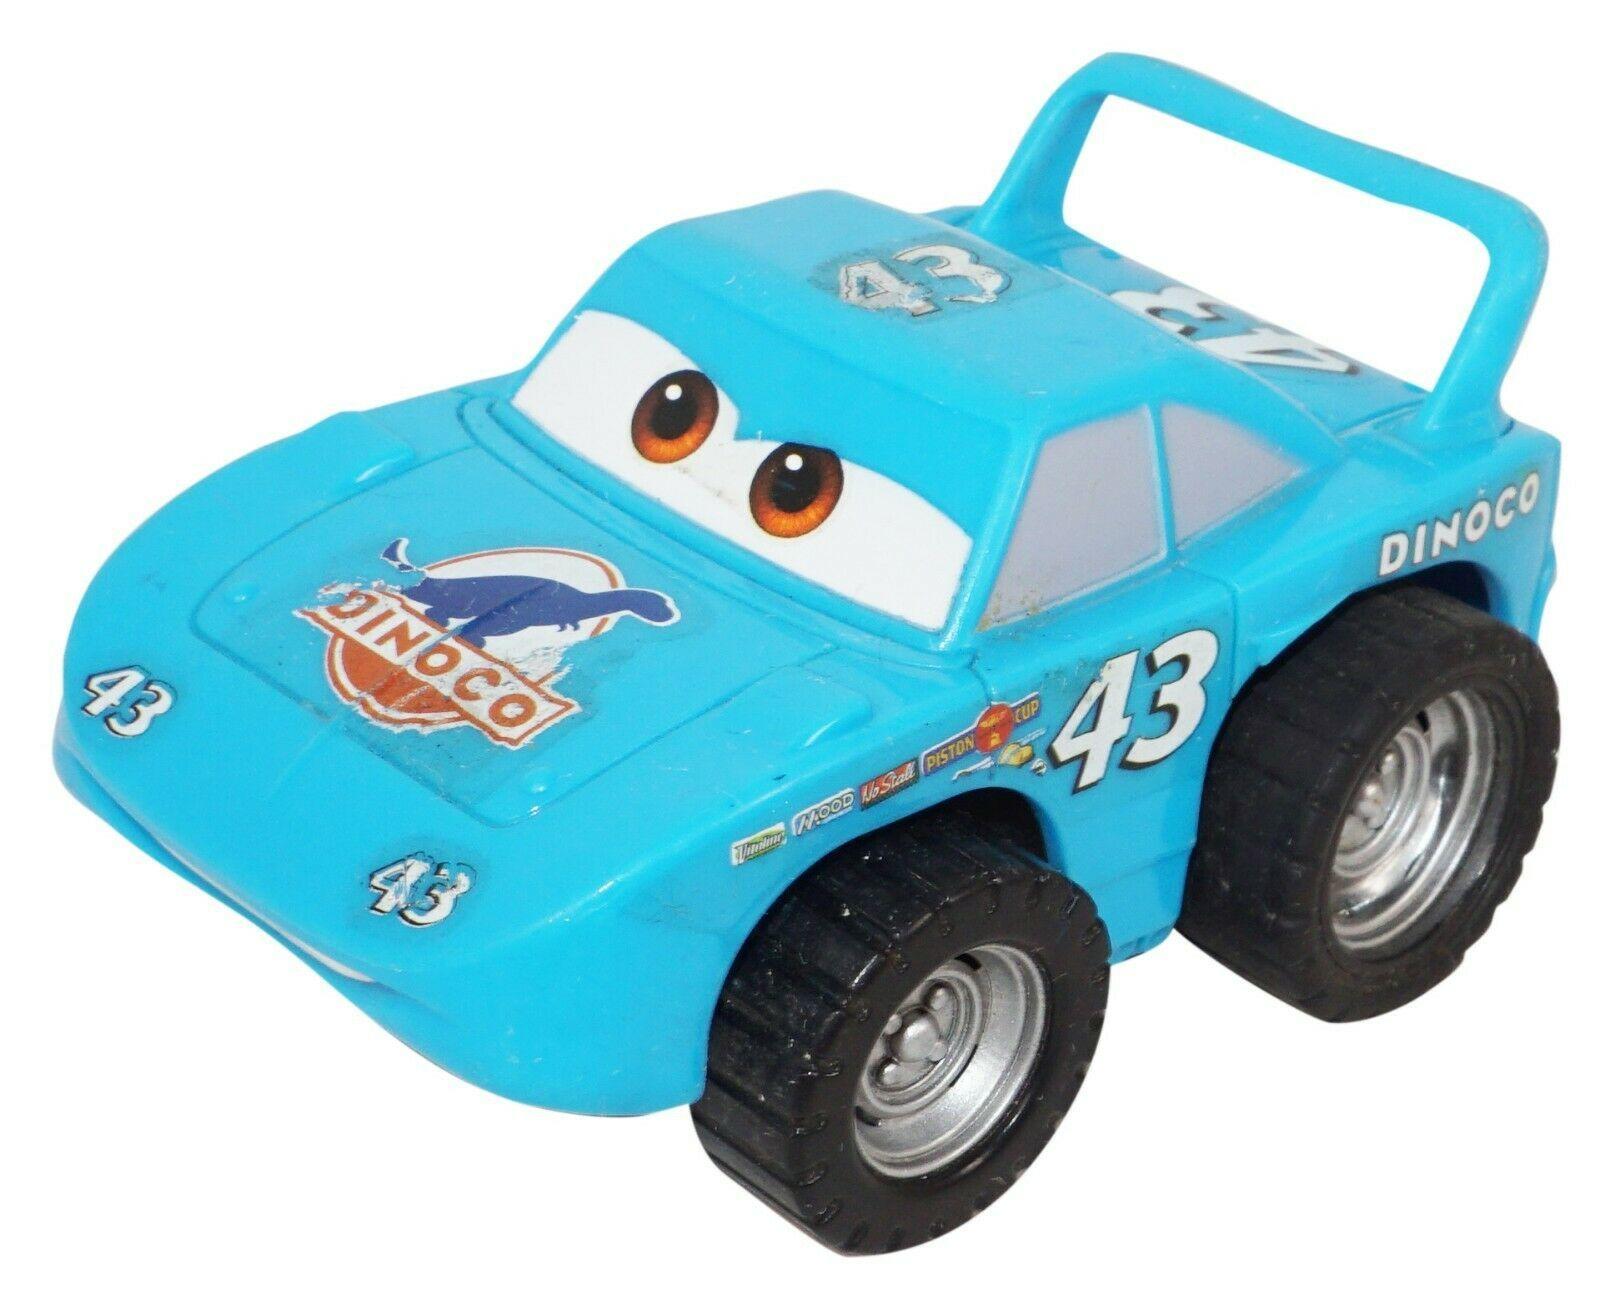 "STRIP 'THE KING' WEATHERS DISNEY PIXAR CARS TOY PULL BACK 3"" DINOCO FIGURE USED - $9.88"